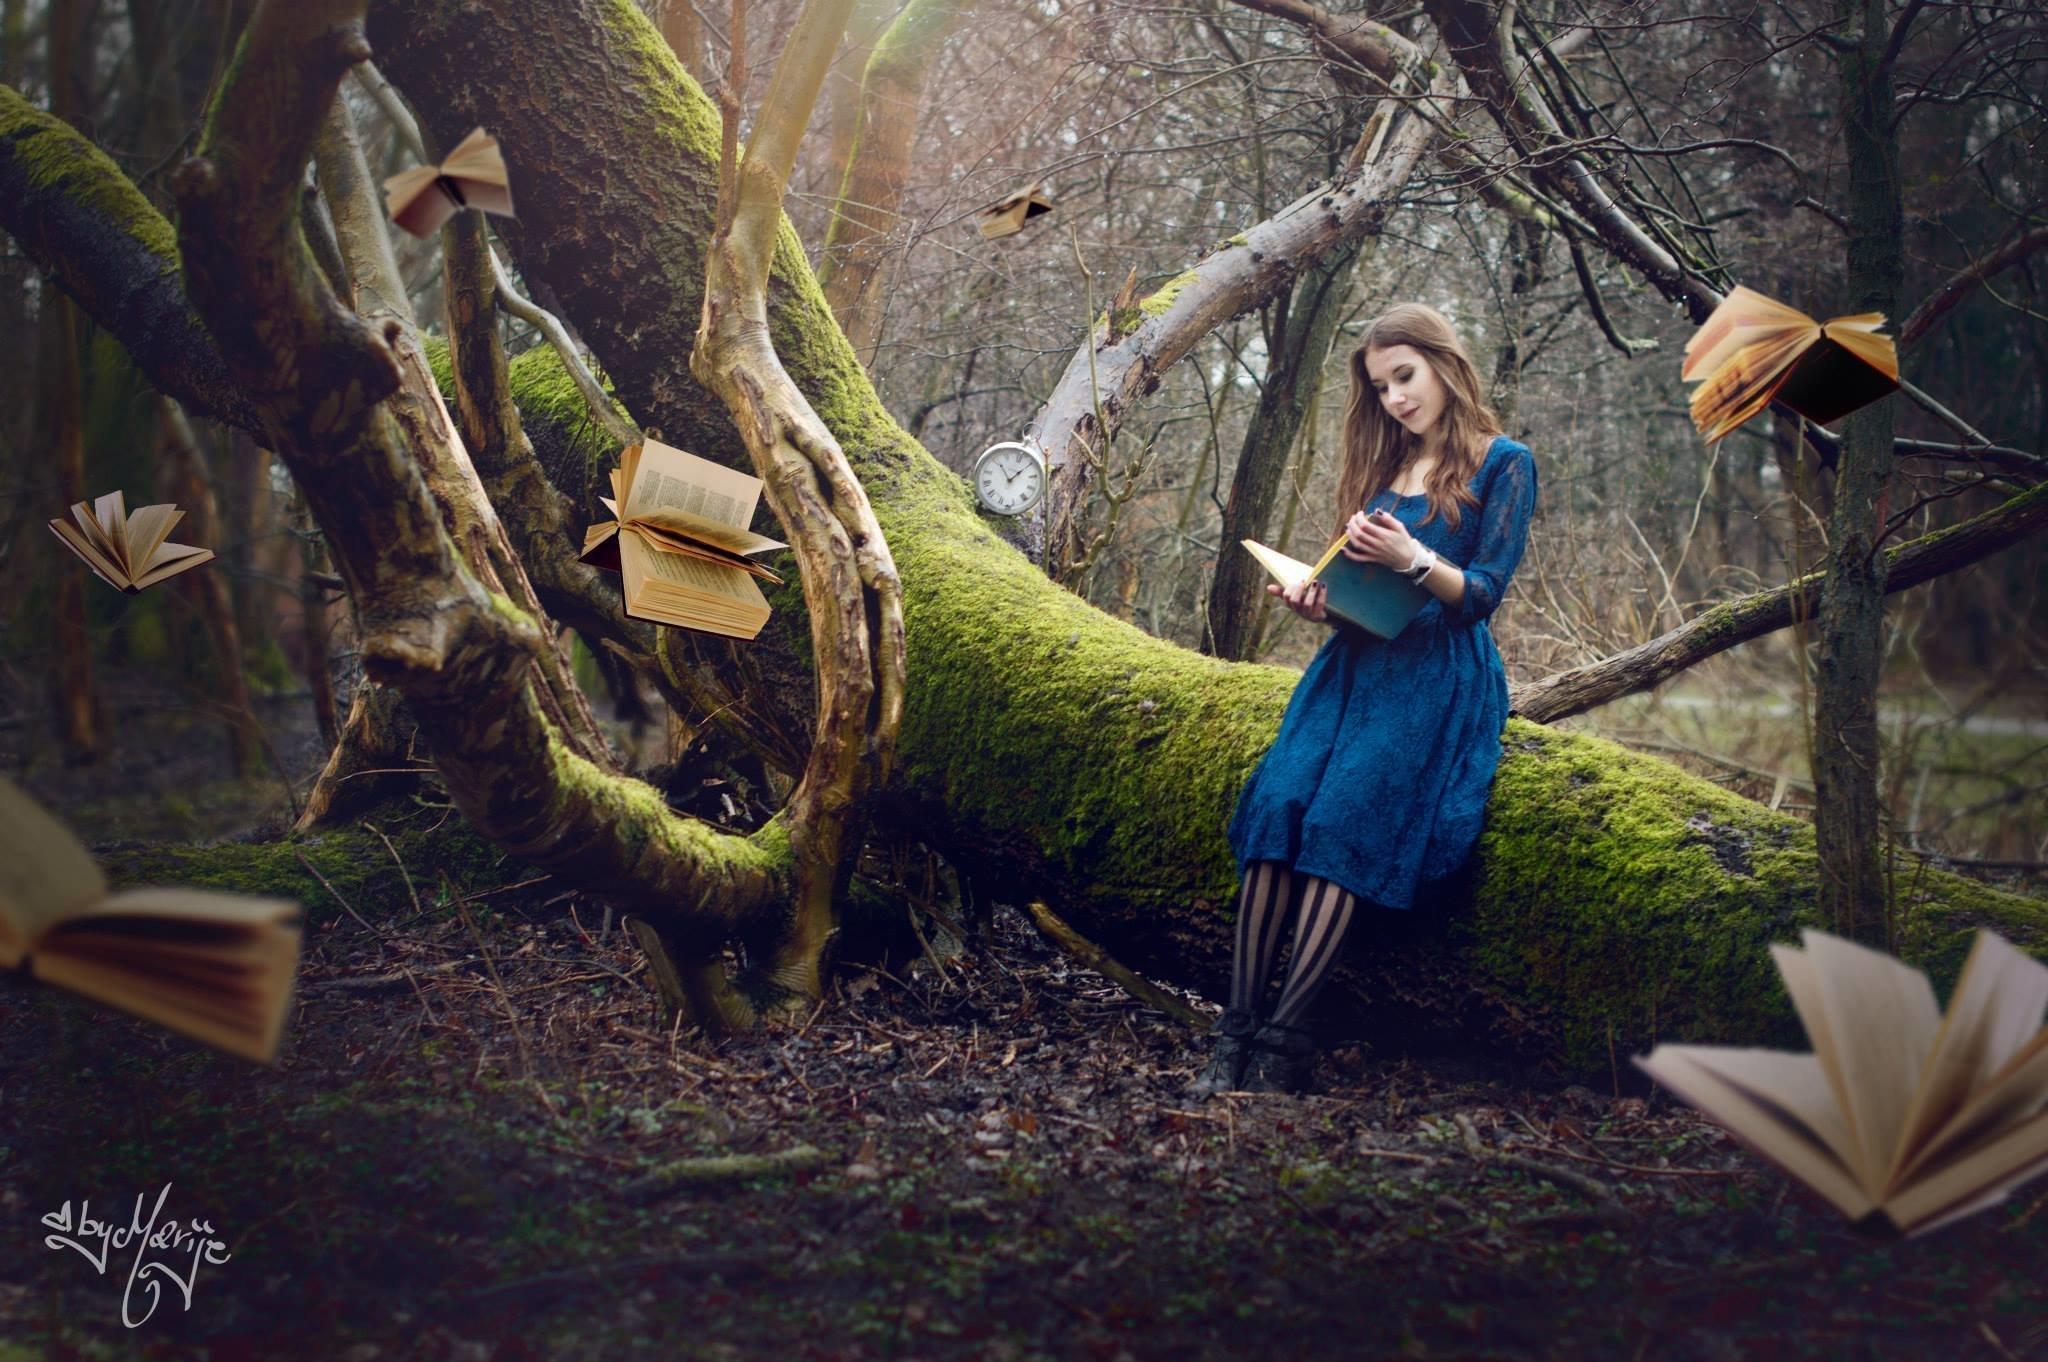 Alice in Wonderland - Model: Shanou Elise